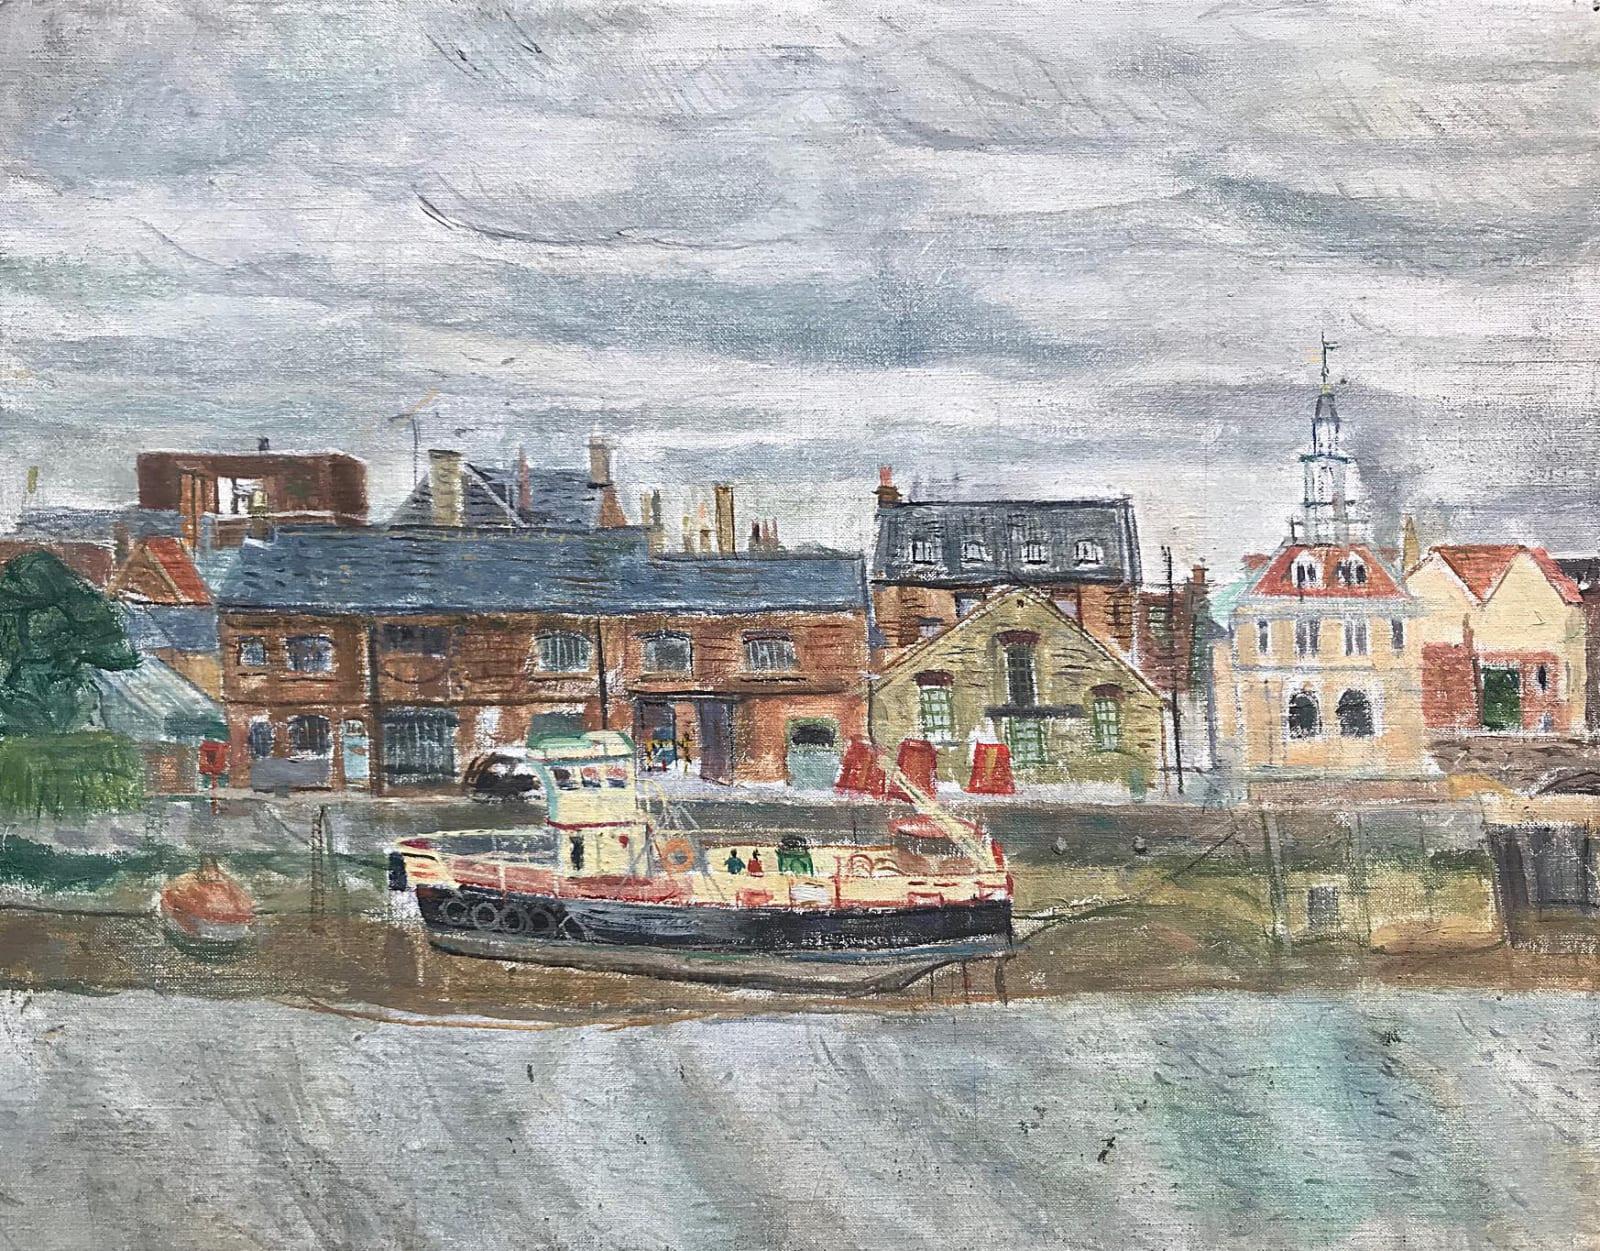 Leonard Mccomb, Trawler at King's Lynn, 1999